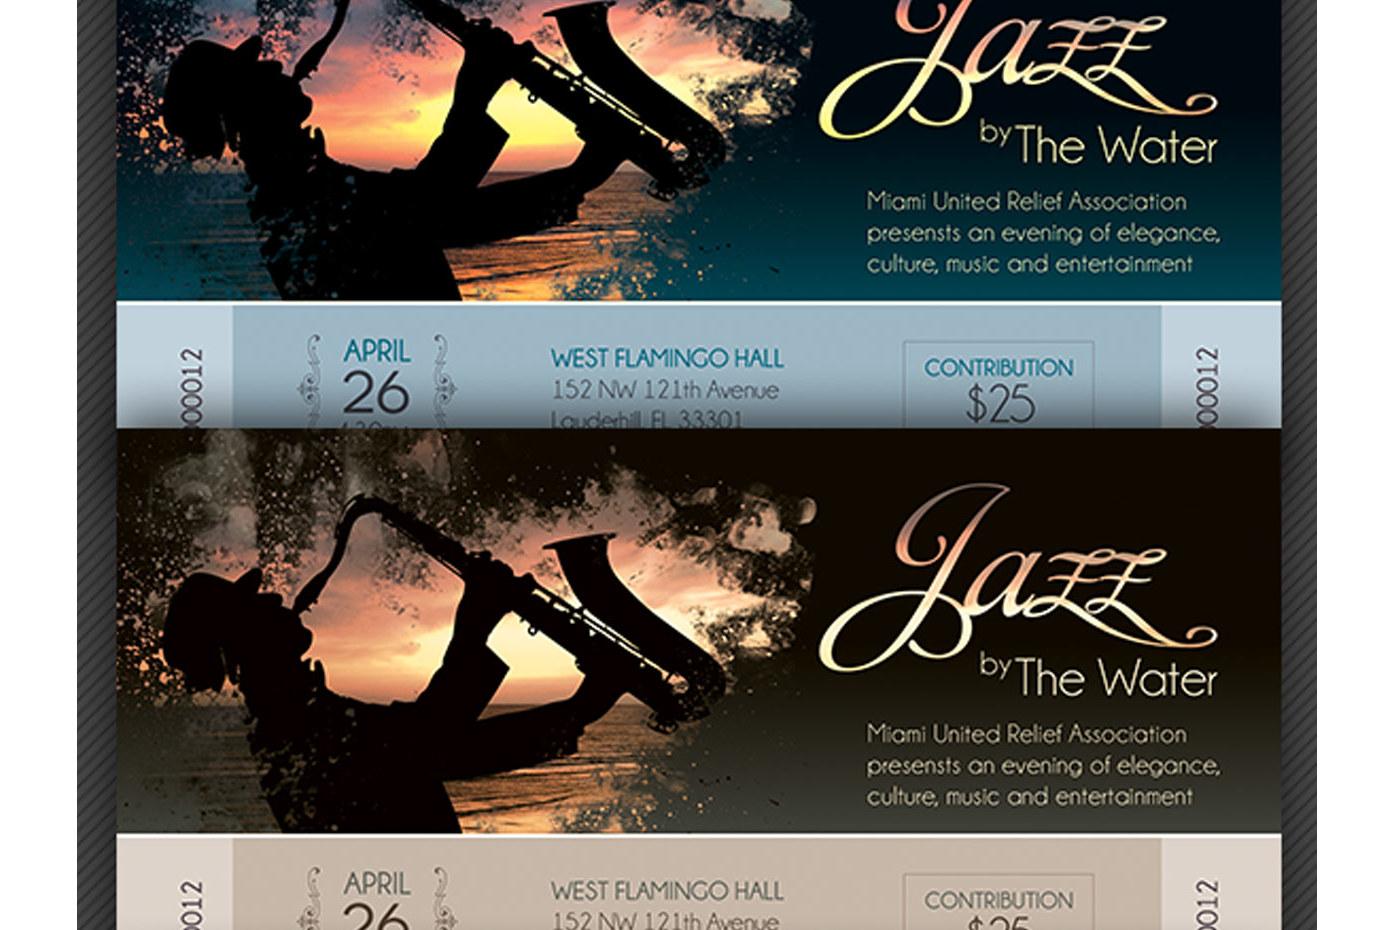 Jazz Concert Event Ticket Template example image 4